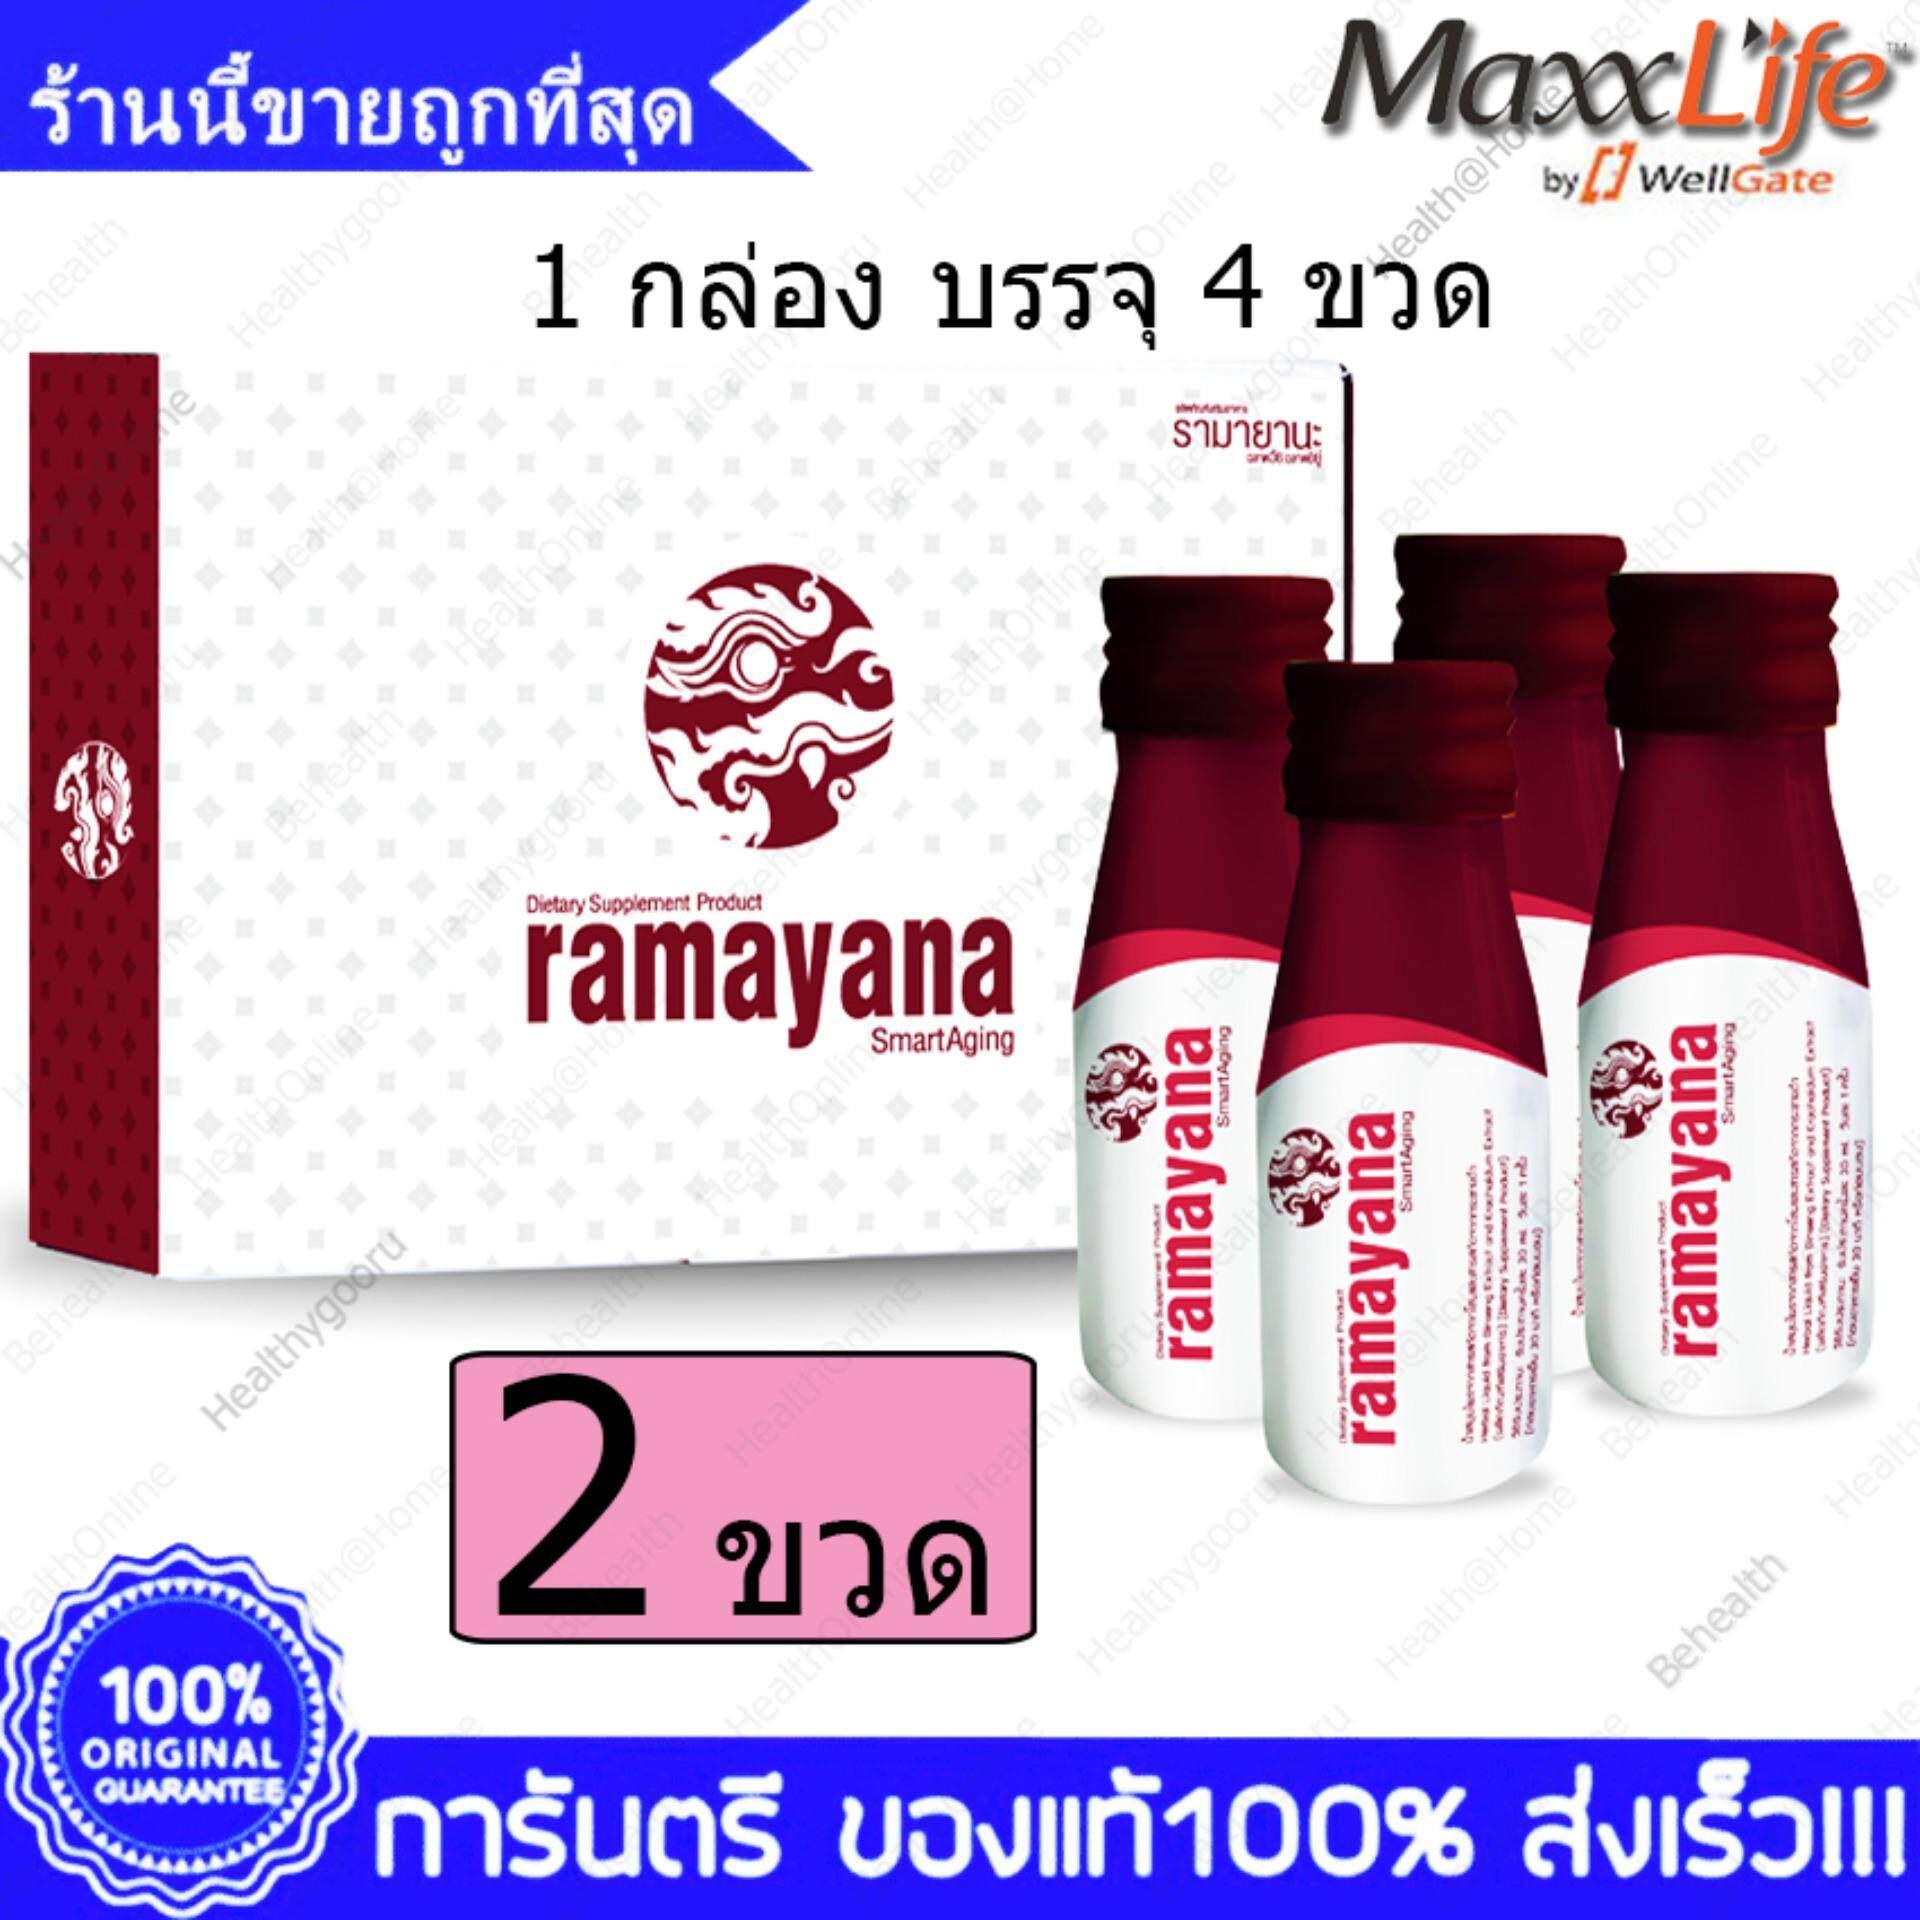 Maxxlife Ramayana Smart Aging แม็กไลฟ์ รามายานะ ต้านอนุมูลอิสระ 60 Cc X 2 ขวด(bottles) By Health@home.